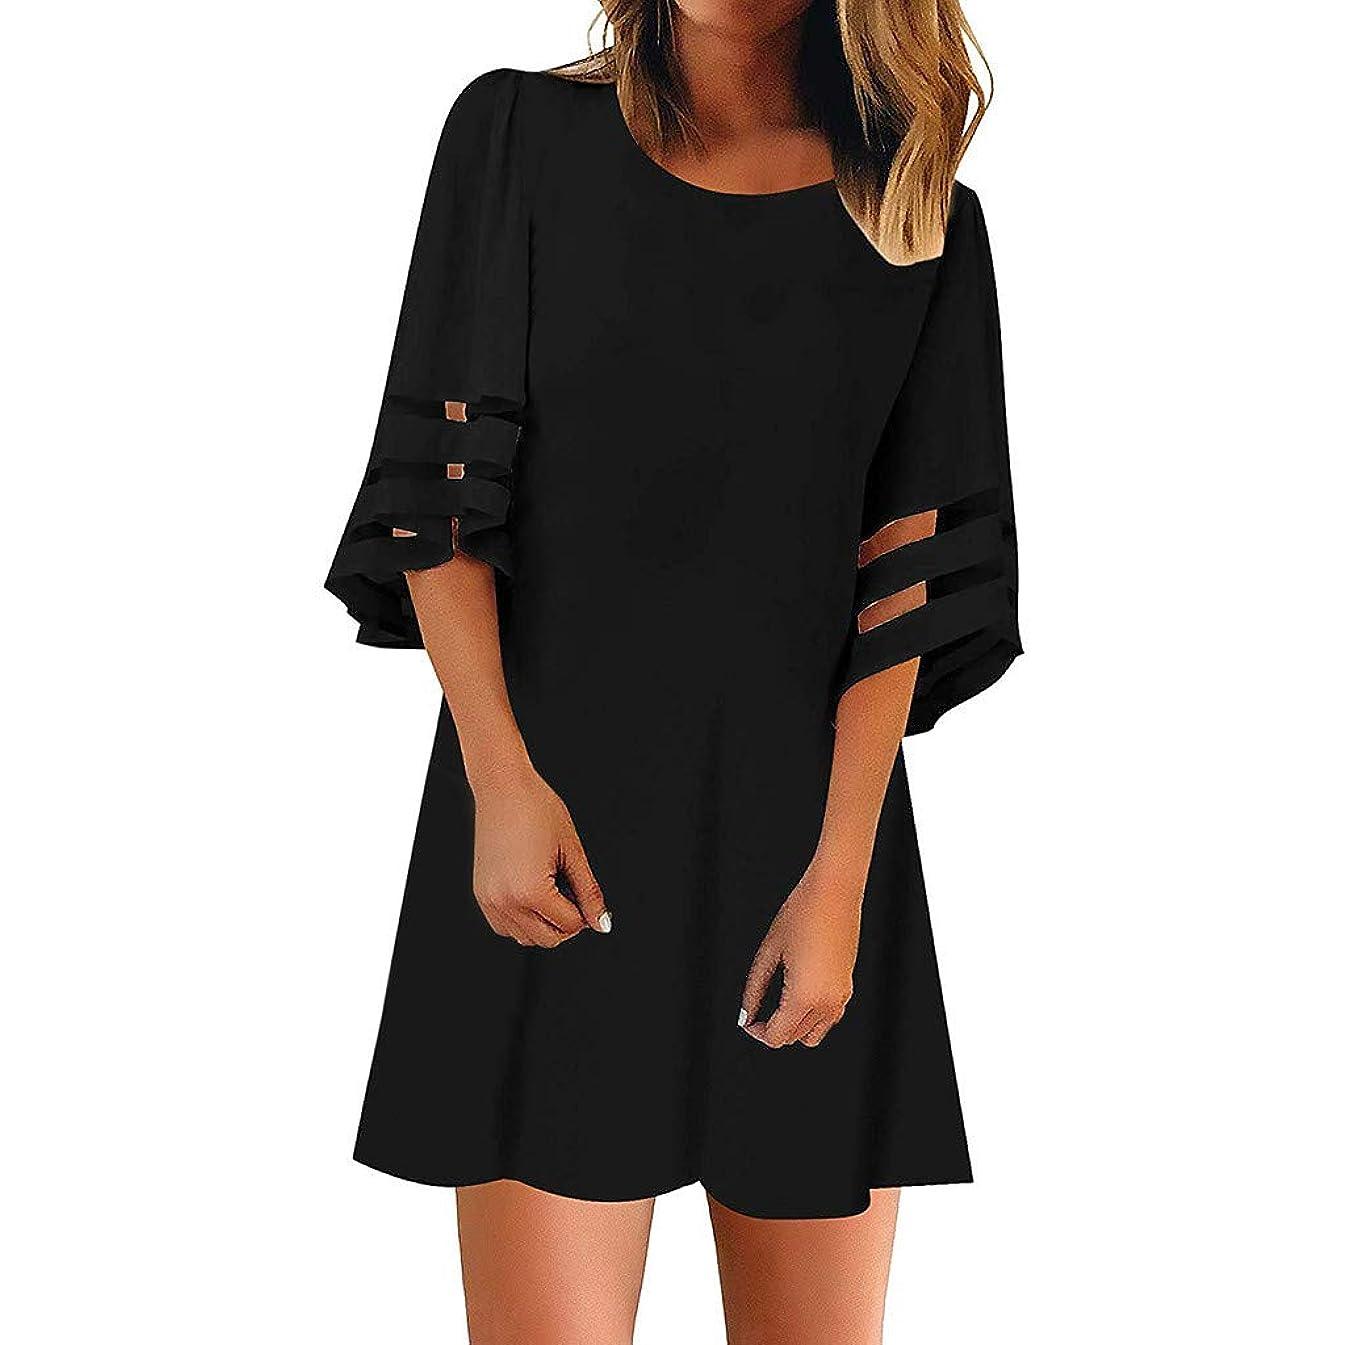 DAYPLAY Women's Mini Dresses Summer Beach O Neck Mesh Panel Blouse 3/4 Bell Sleeve Loose Top Shirt Dress 2019 Sale